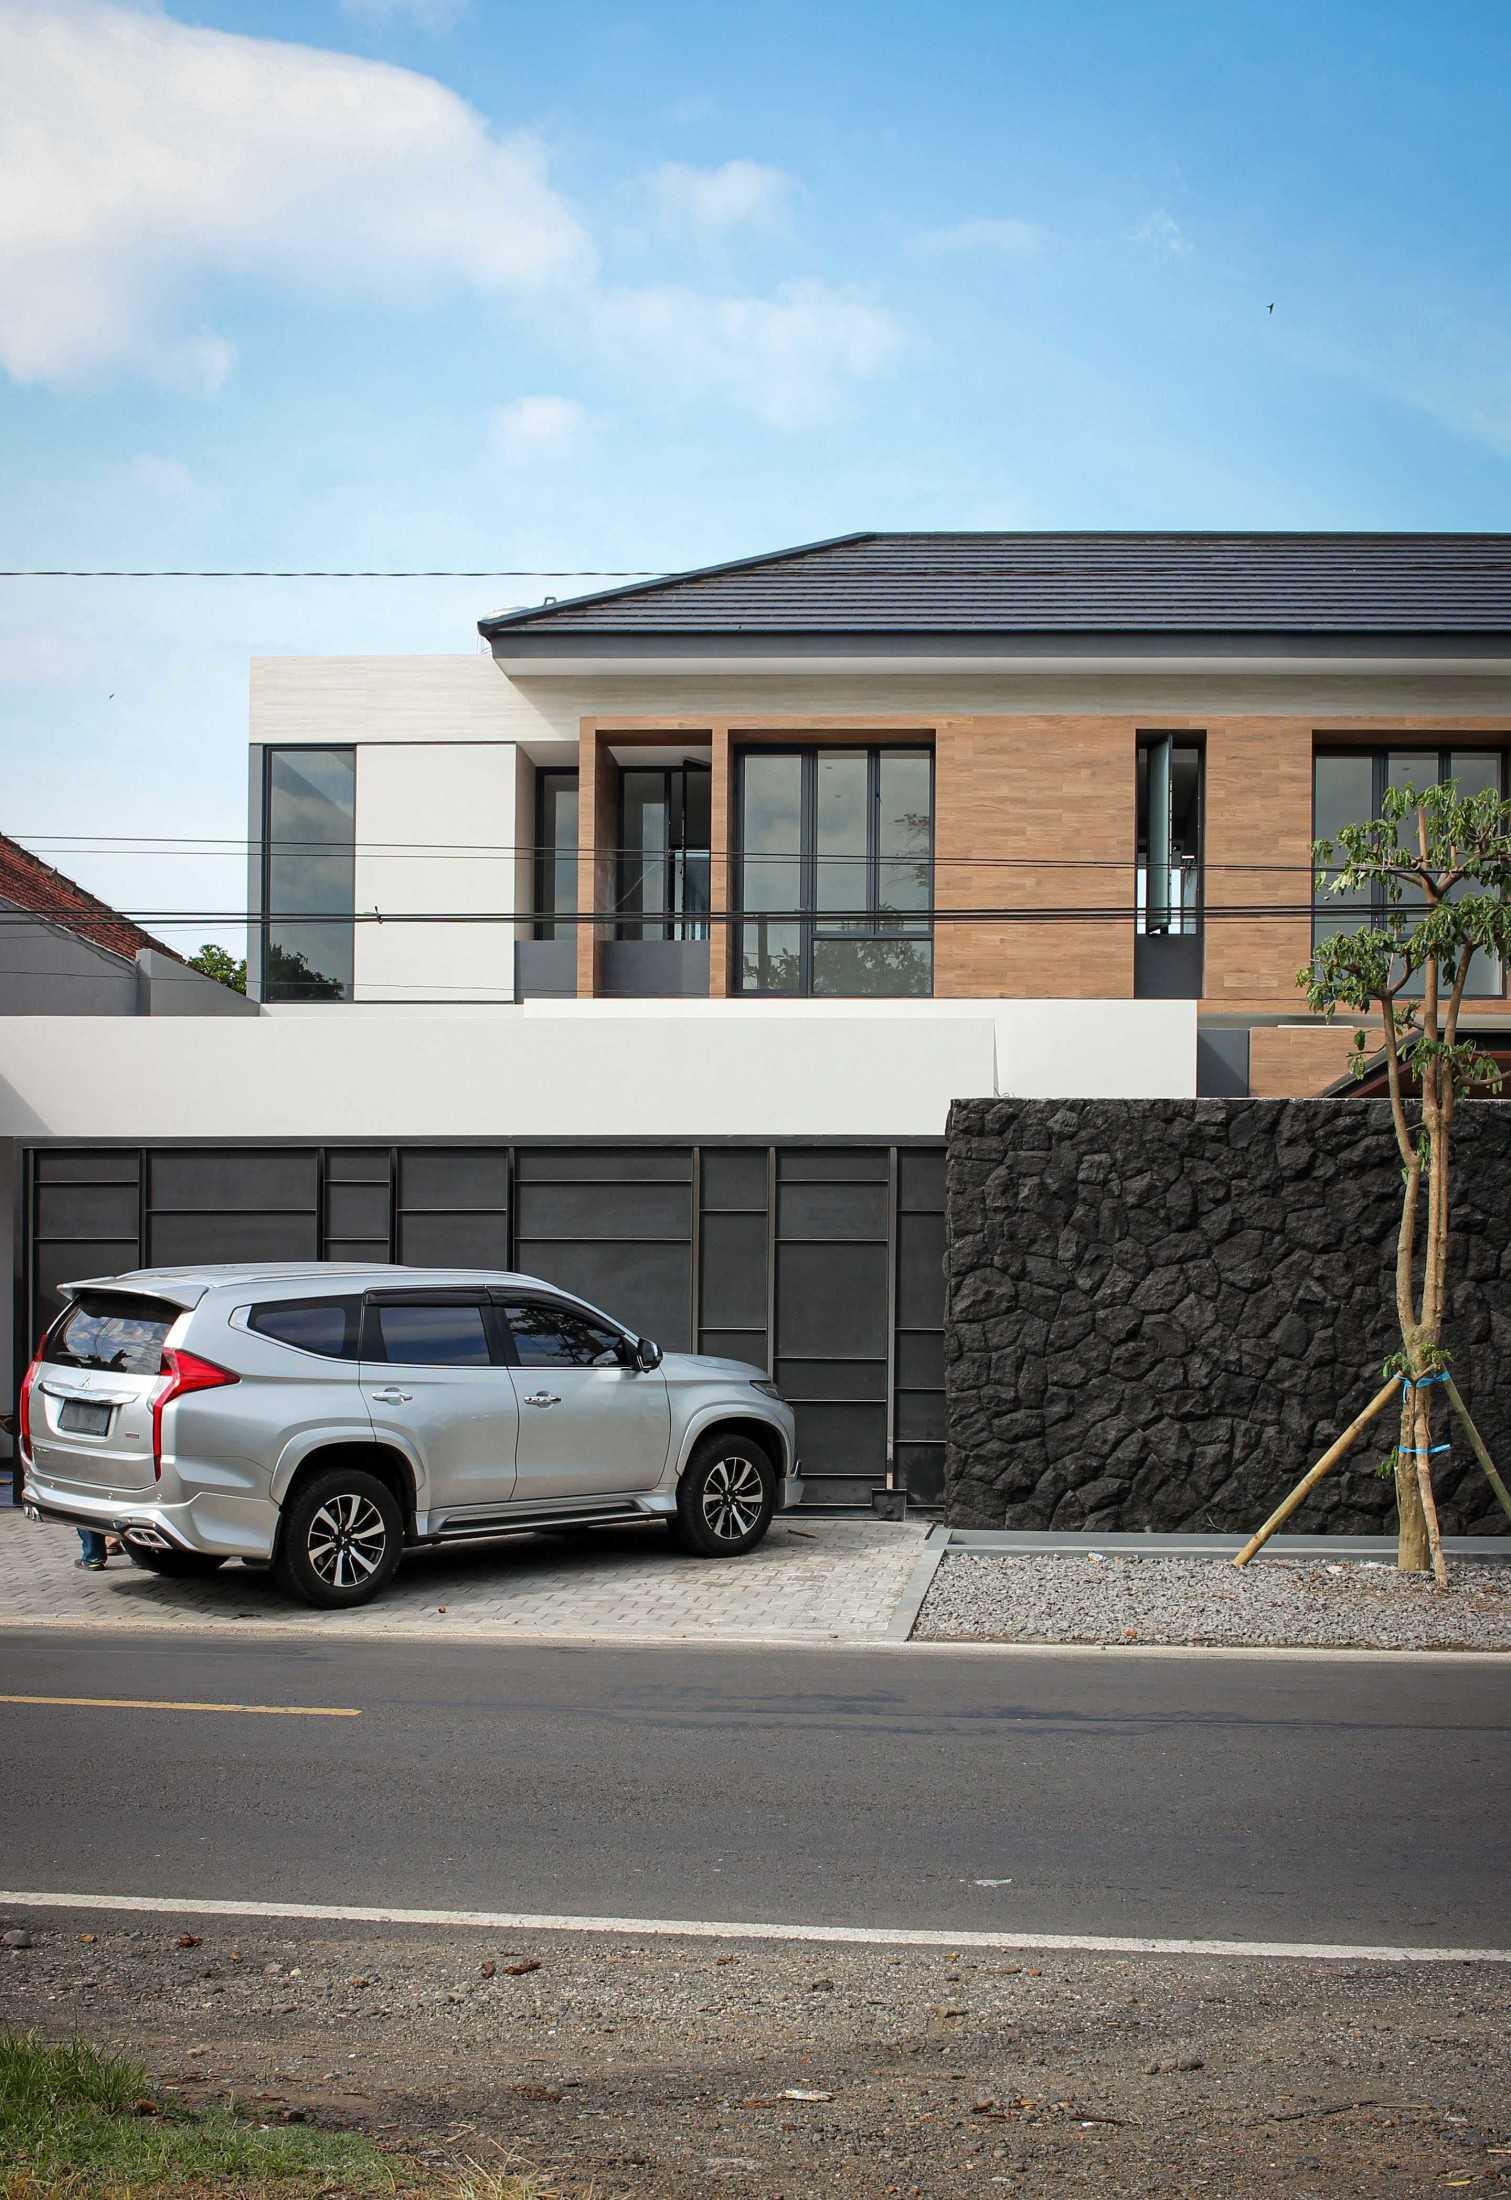 Y0 Design Architect S House Kec. Srono, Kabupaten Banyuwangi, Jawa Timur, Indonesia Kec. Srono, Kabupaten Banyuwangi, Jawa Timur, Indonesia Yohanes-Iswara-Limandjaya-S-House  121068